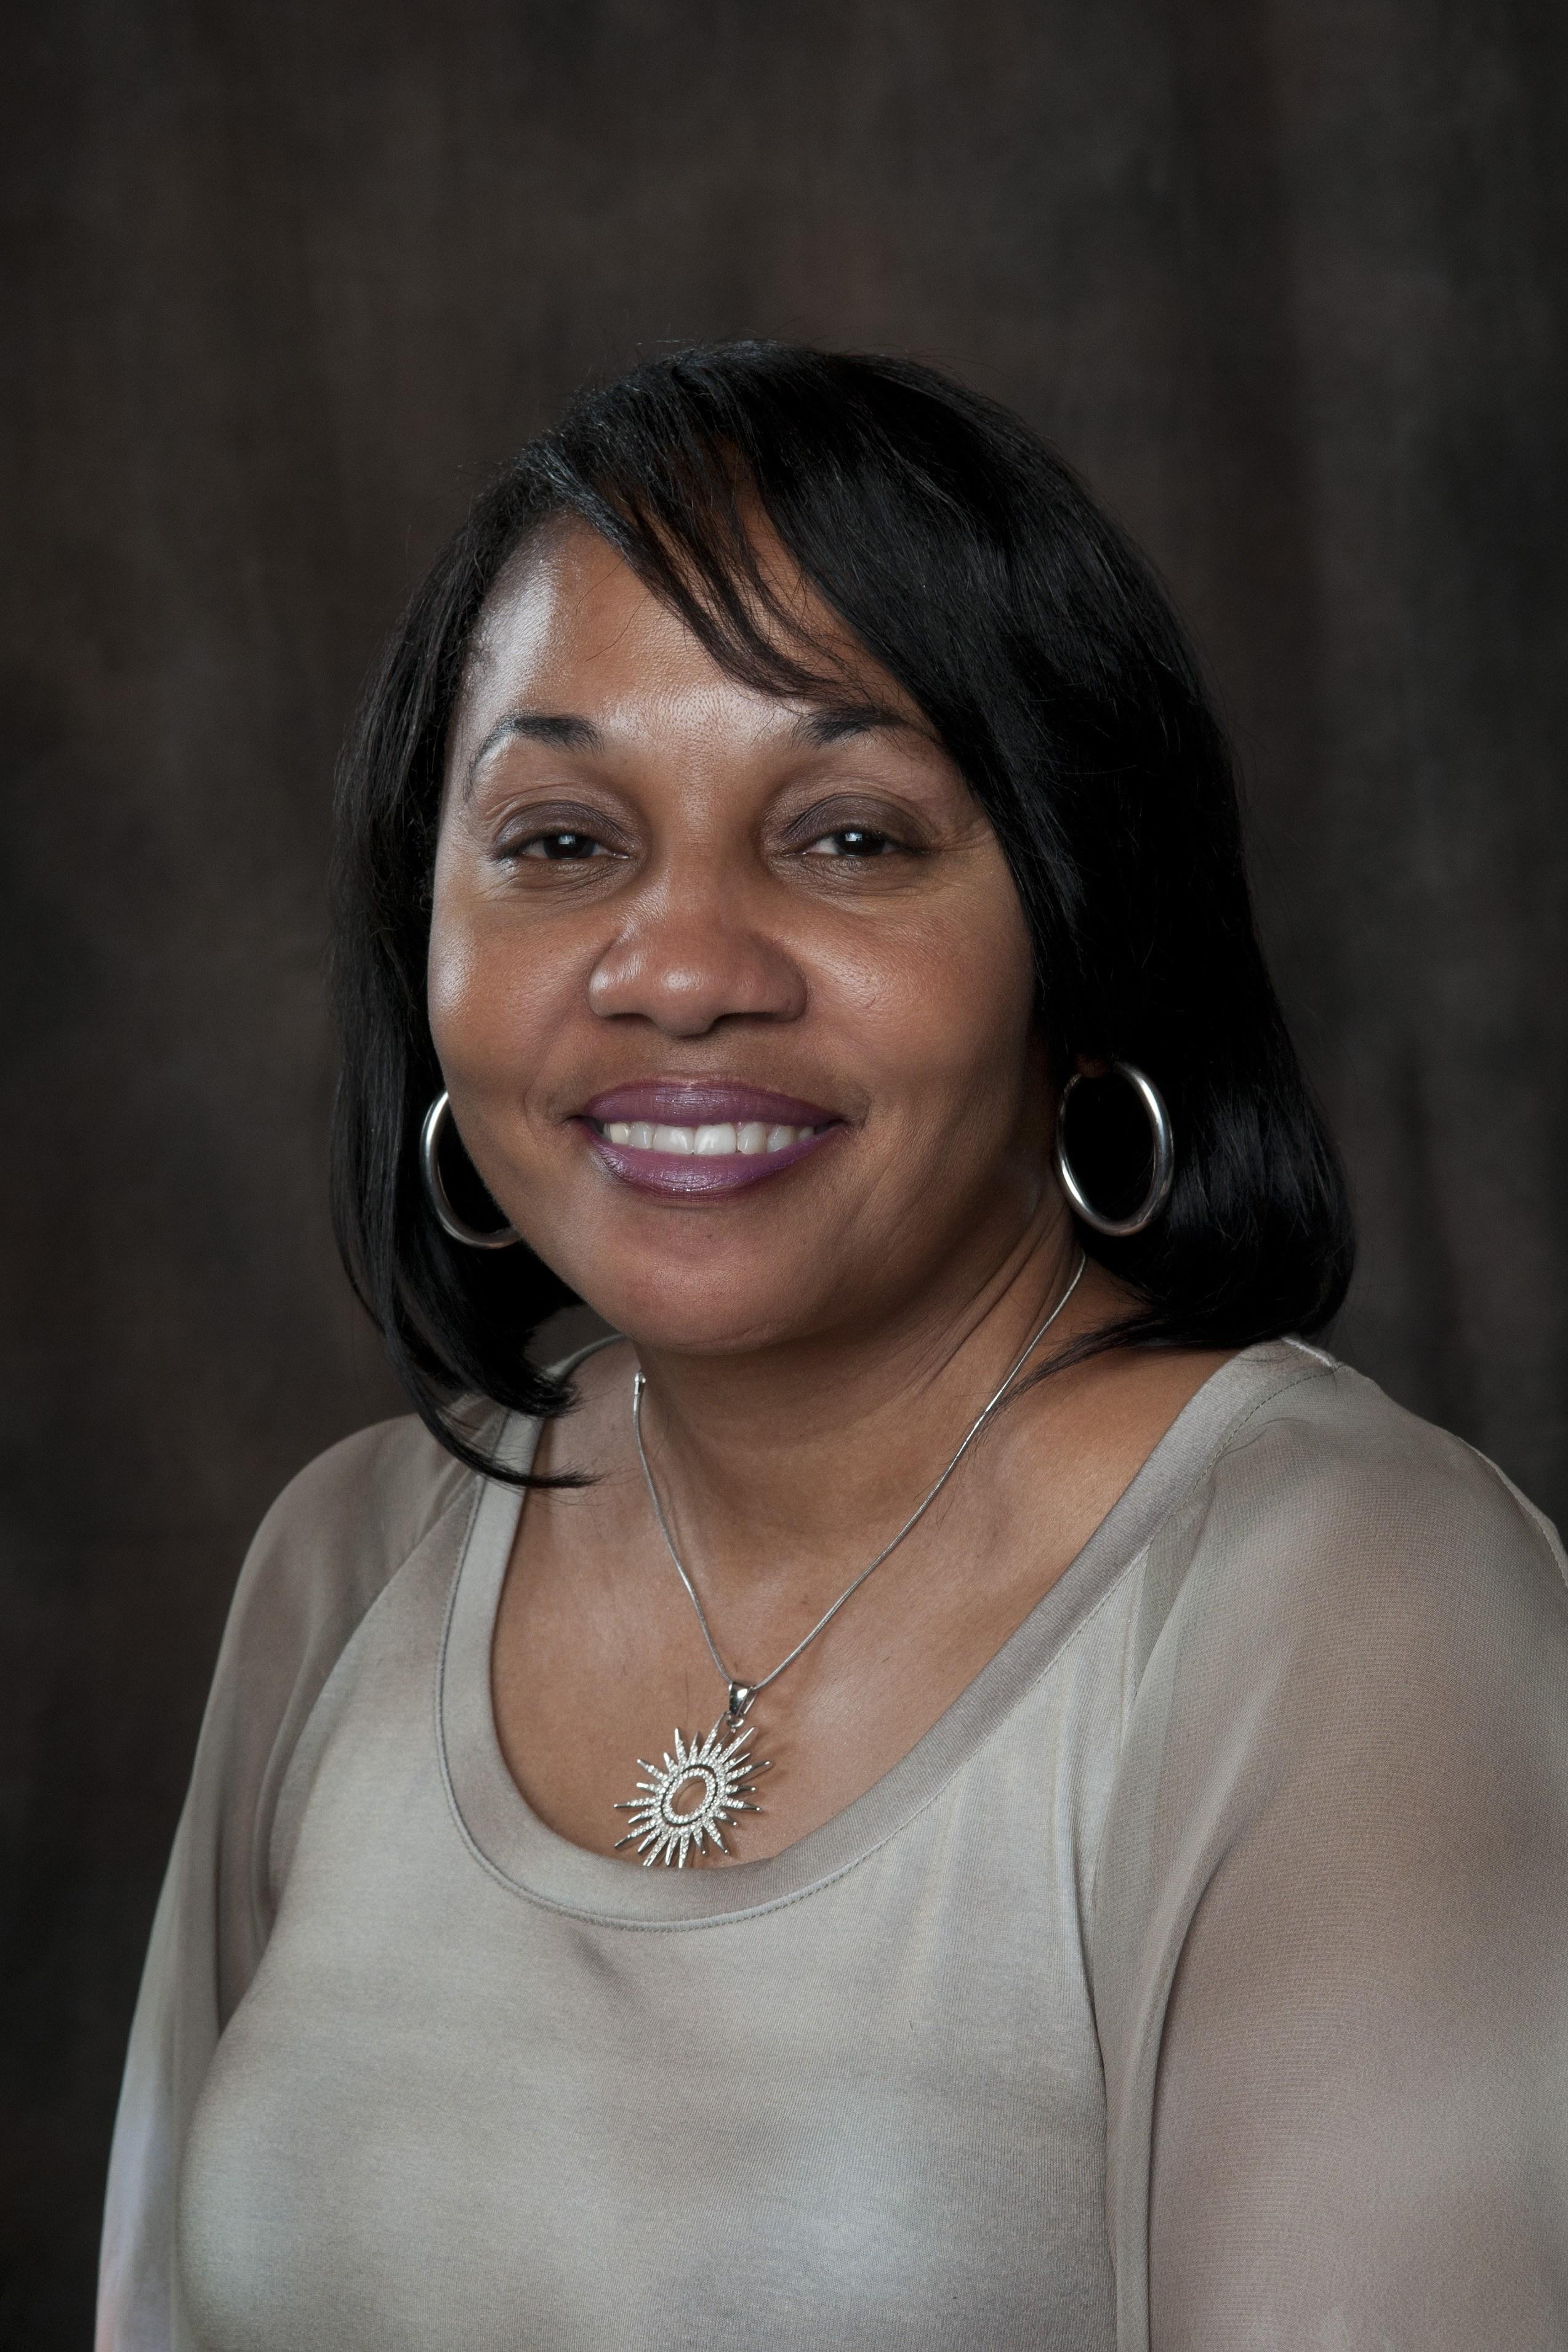 Dr. Janice Richardson, Principal of VHS